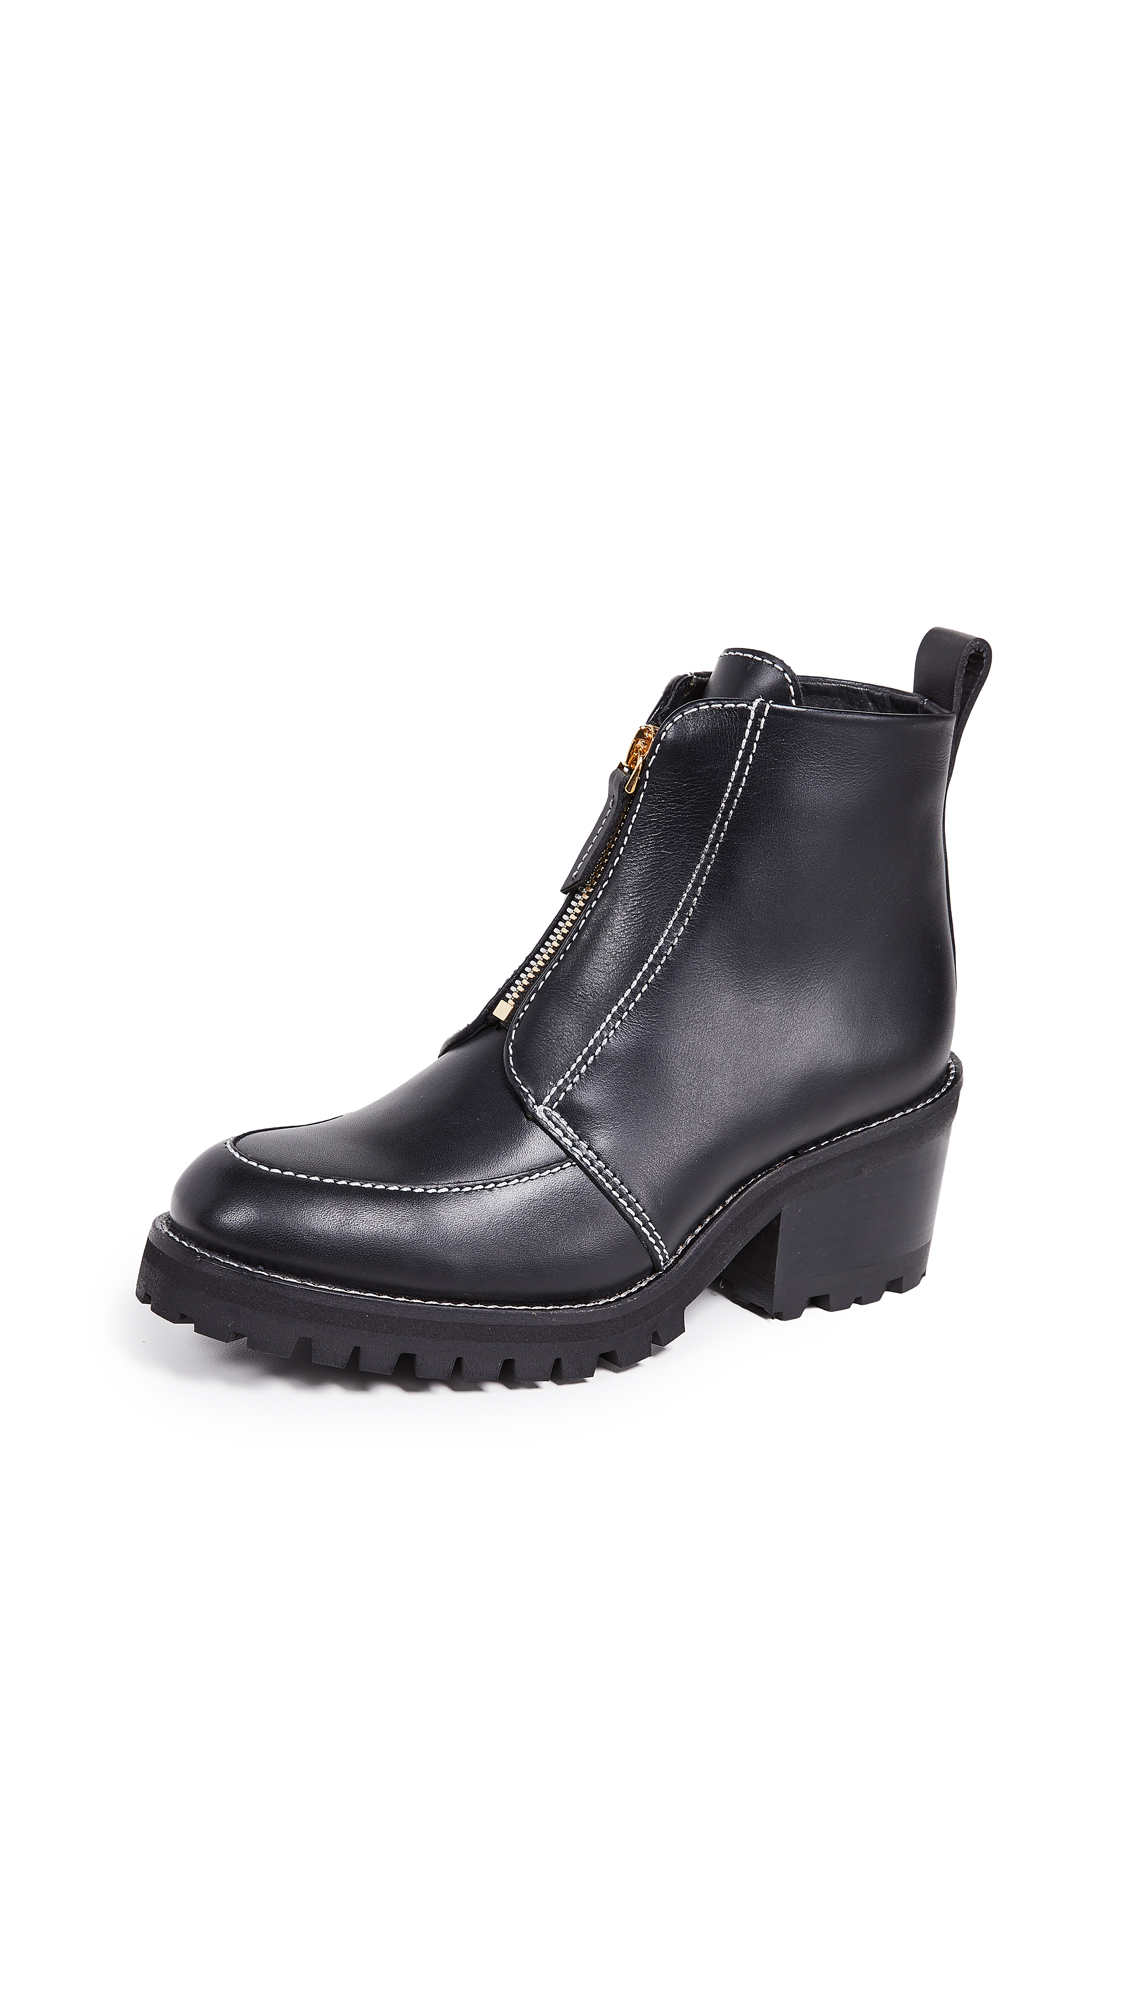 WANT Les Essentiels Varela High Zipped Derby Boots - Black